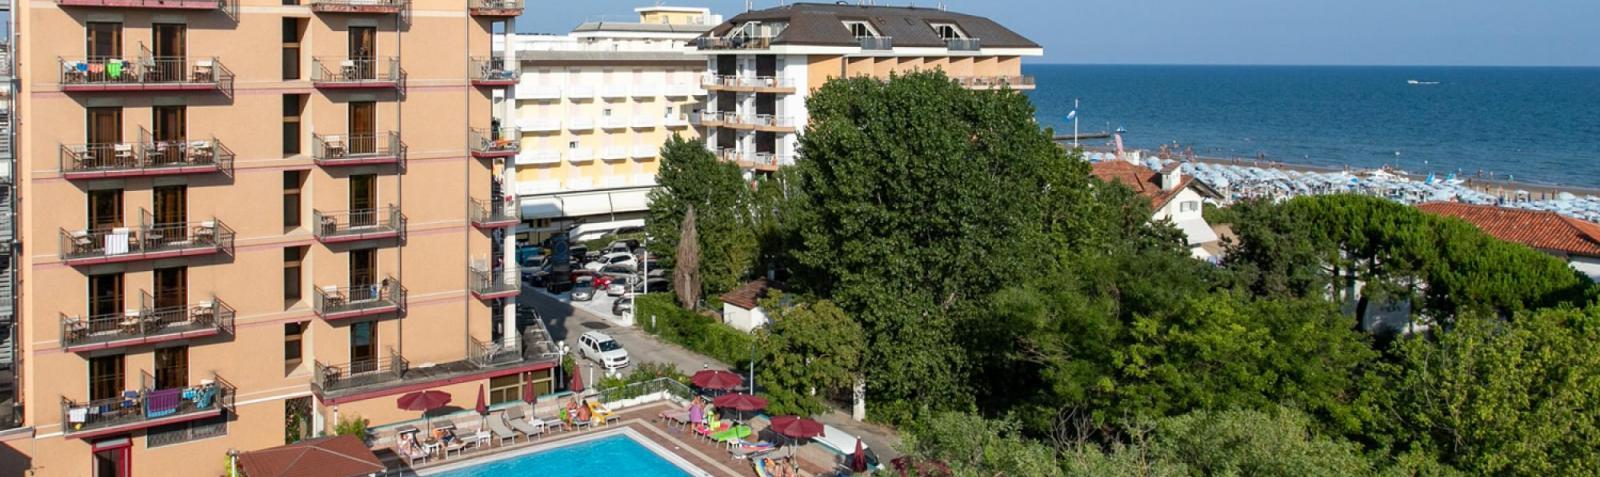 Hotel Sofia Jesolo